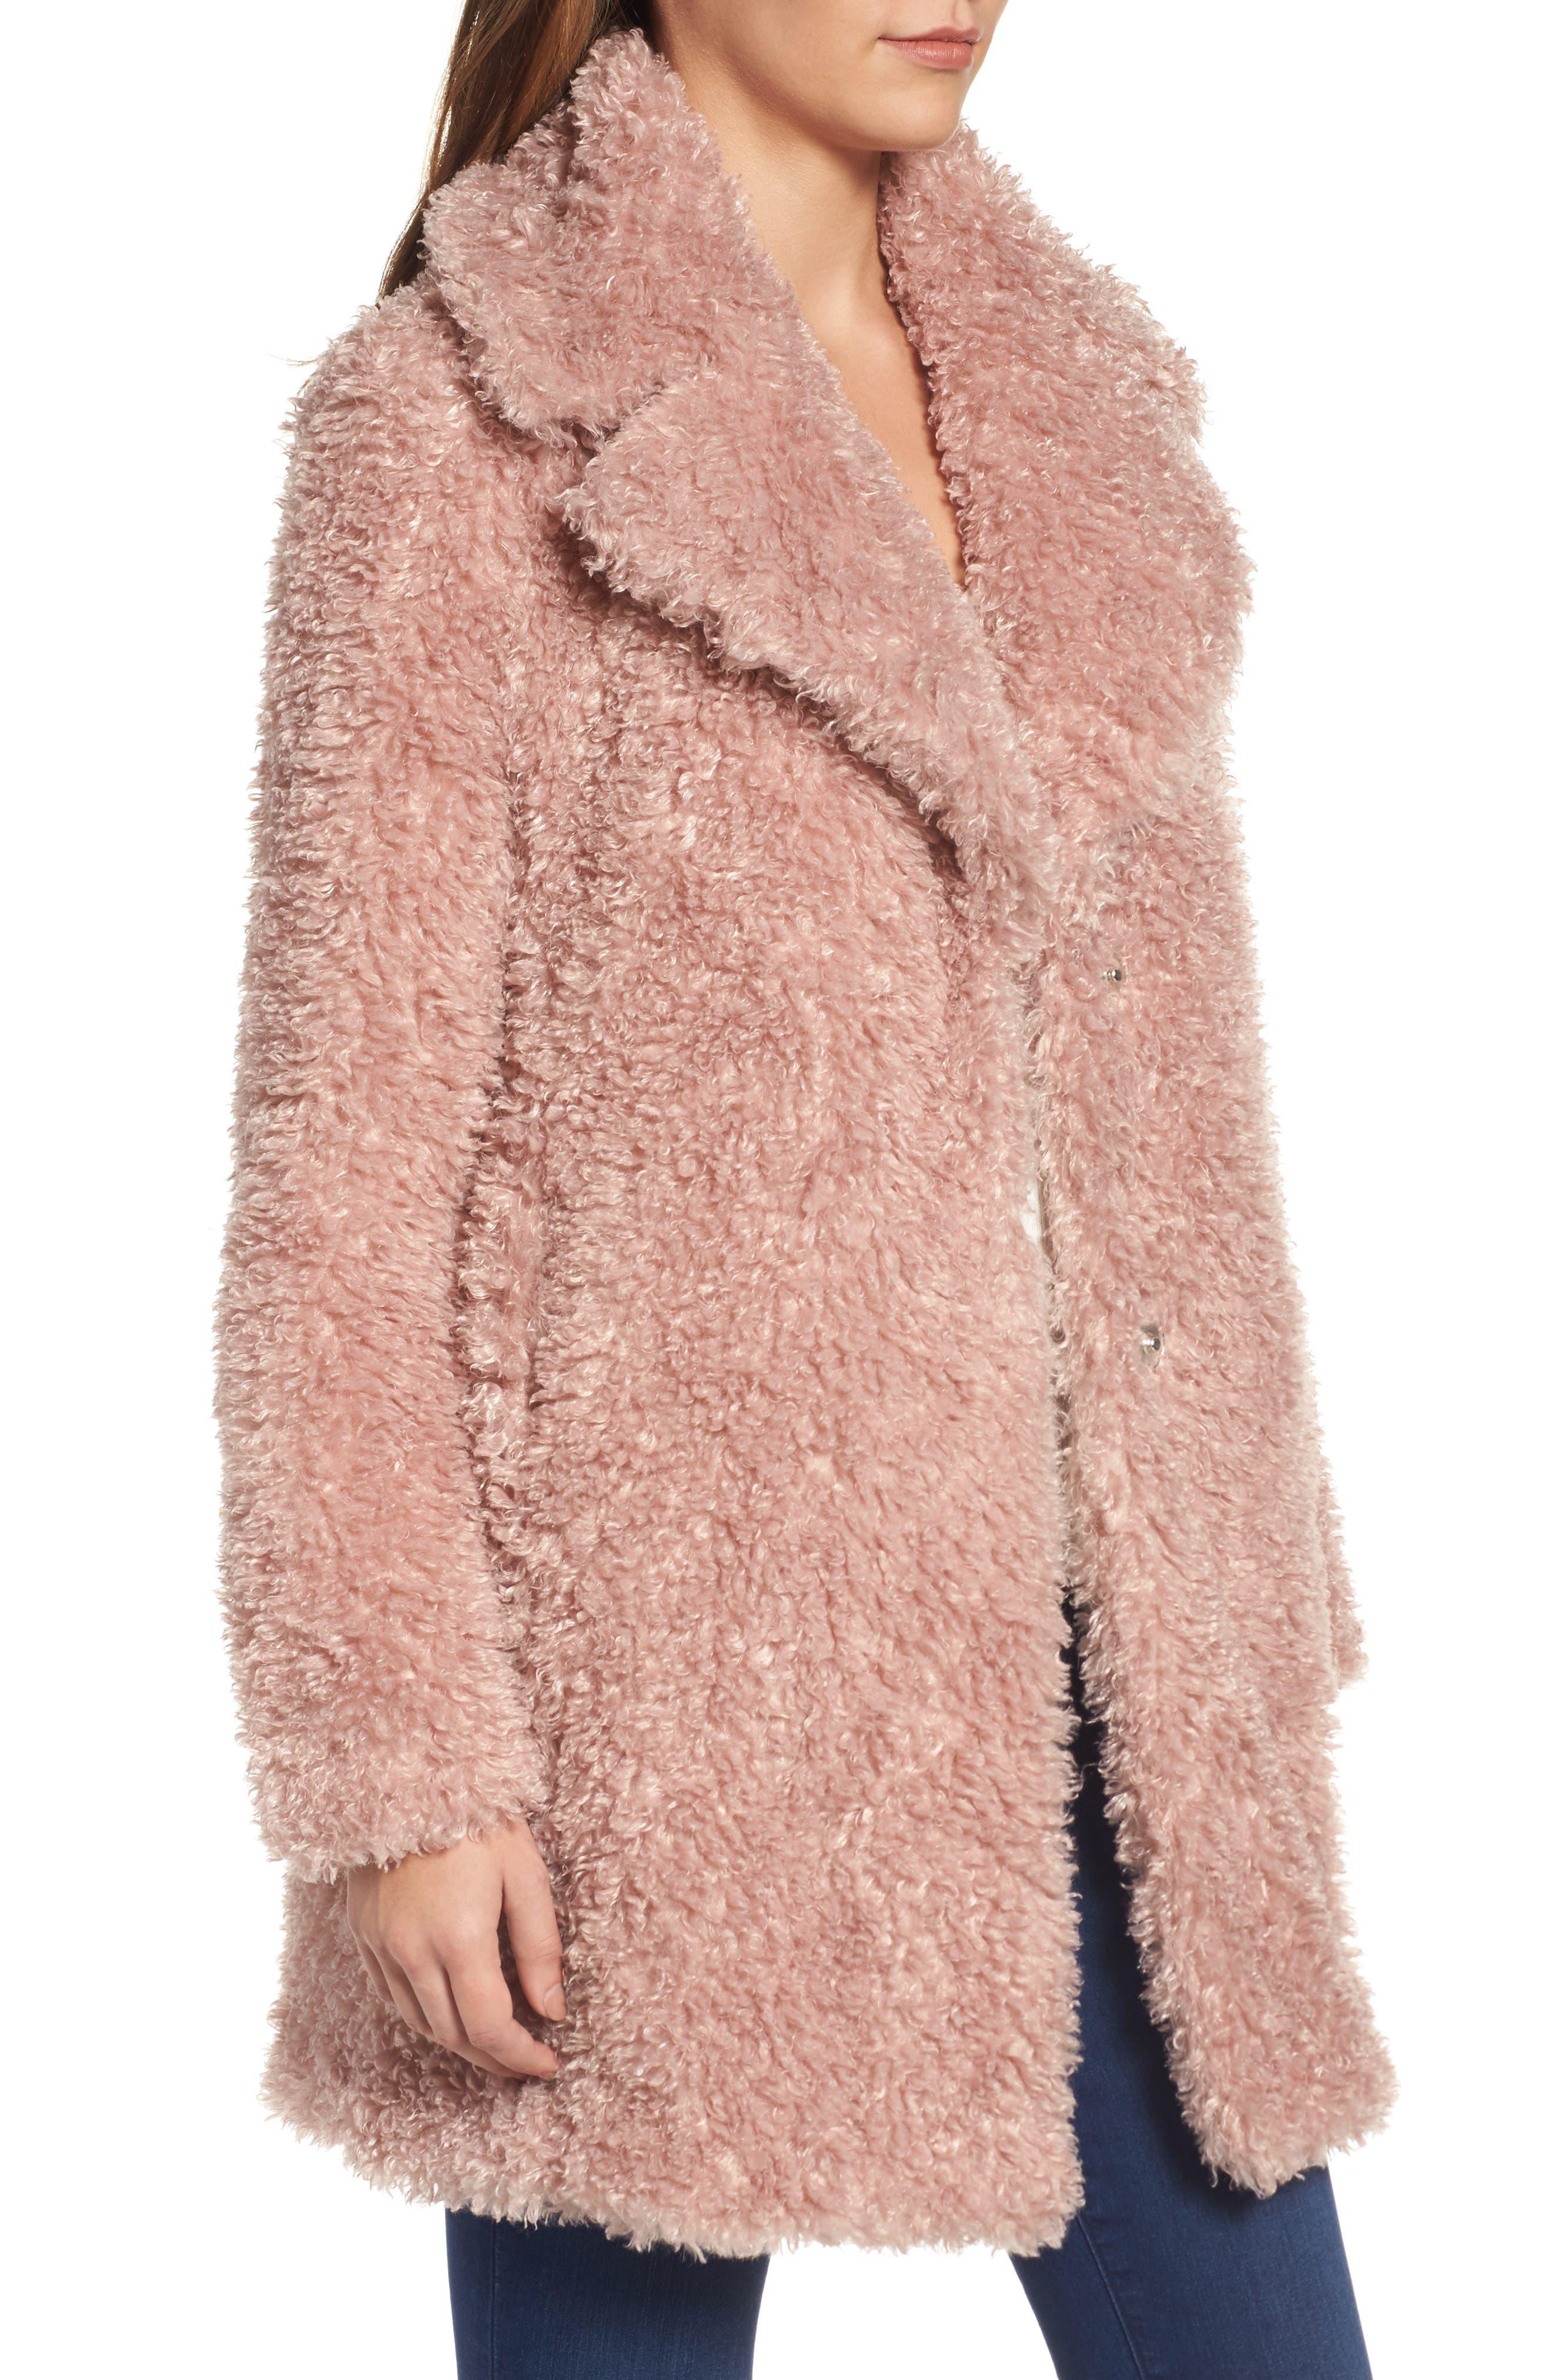 'Teddy Bear' Notch Collar Reversible Faux Fur Coat,                             Alternate thumbnail 14, color,